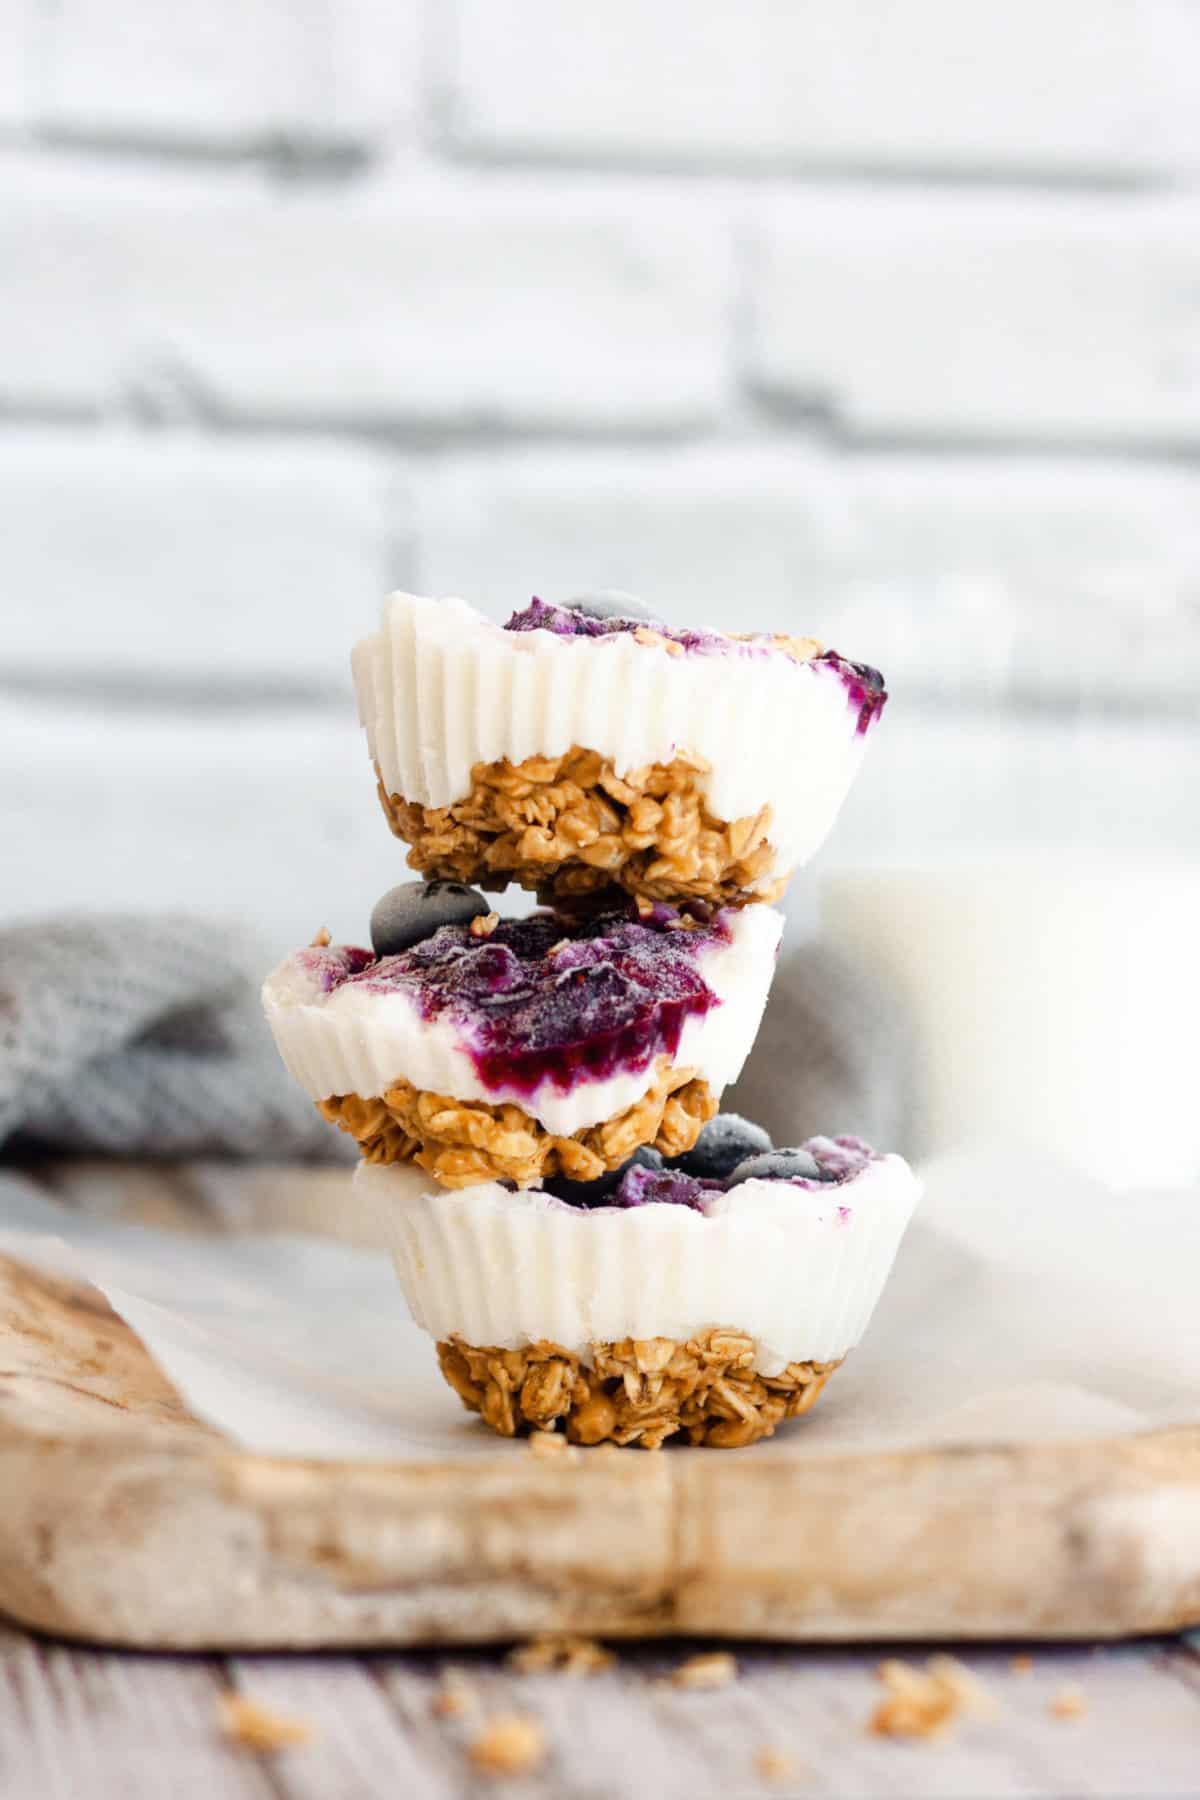 Frozen yogurt with blueberry and granola